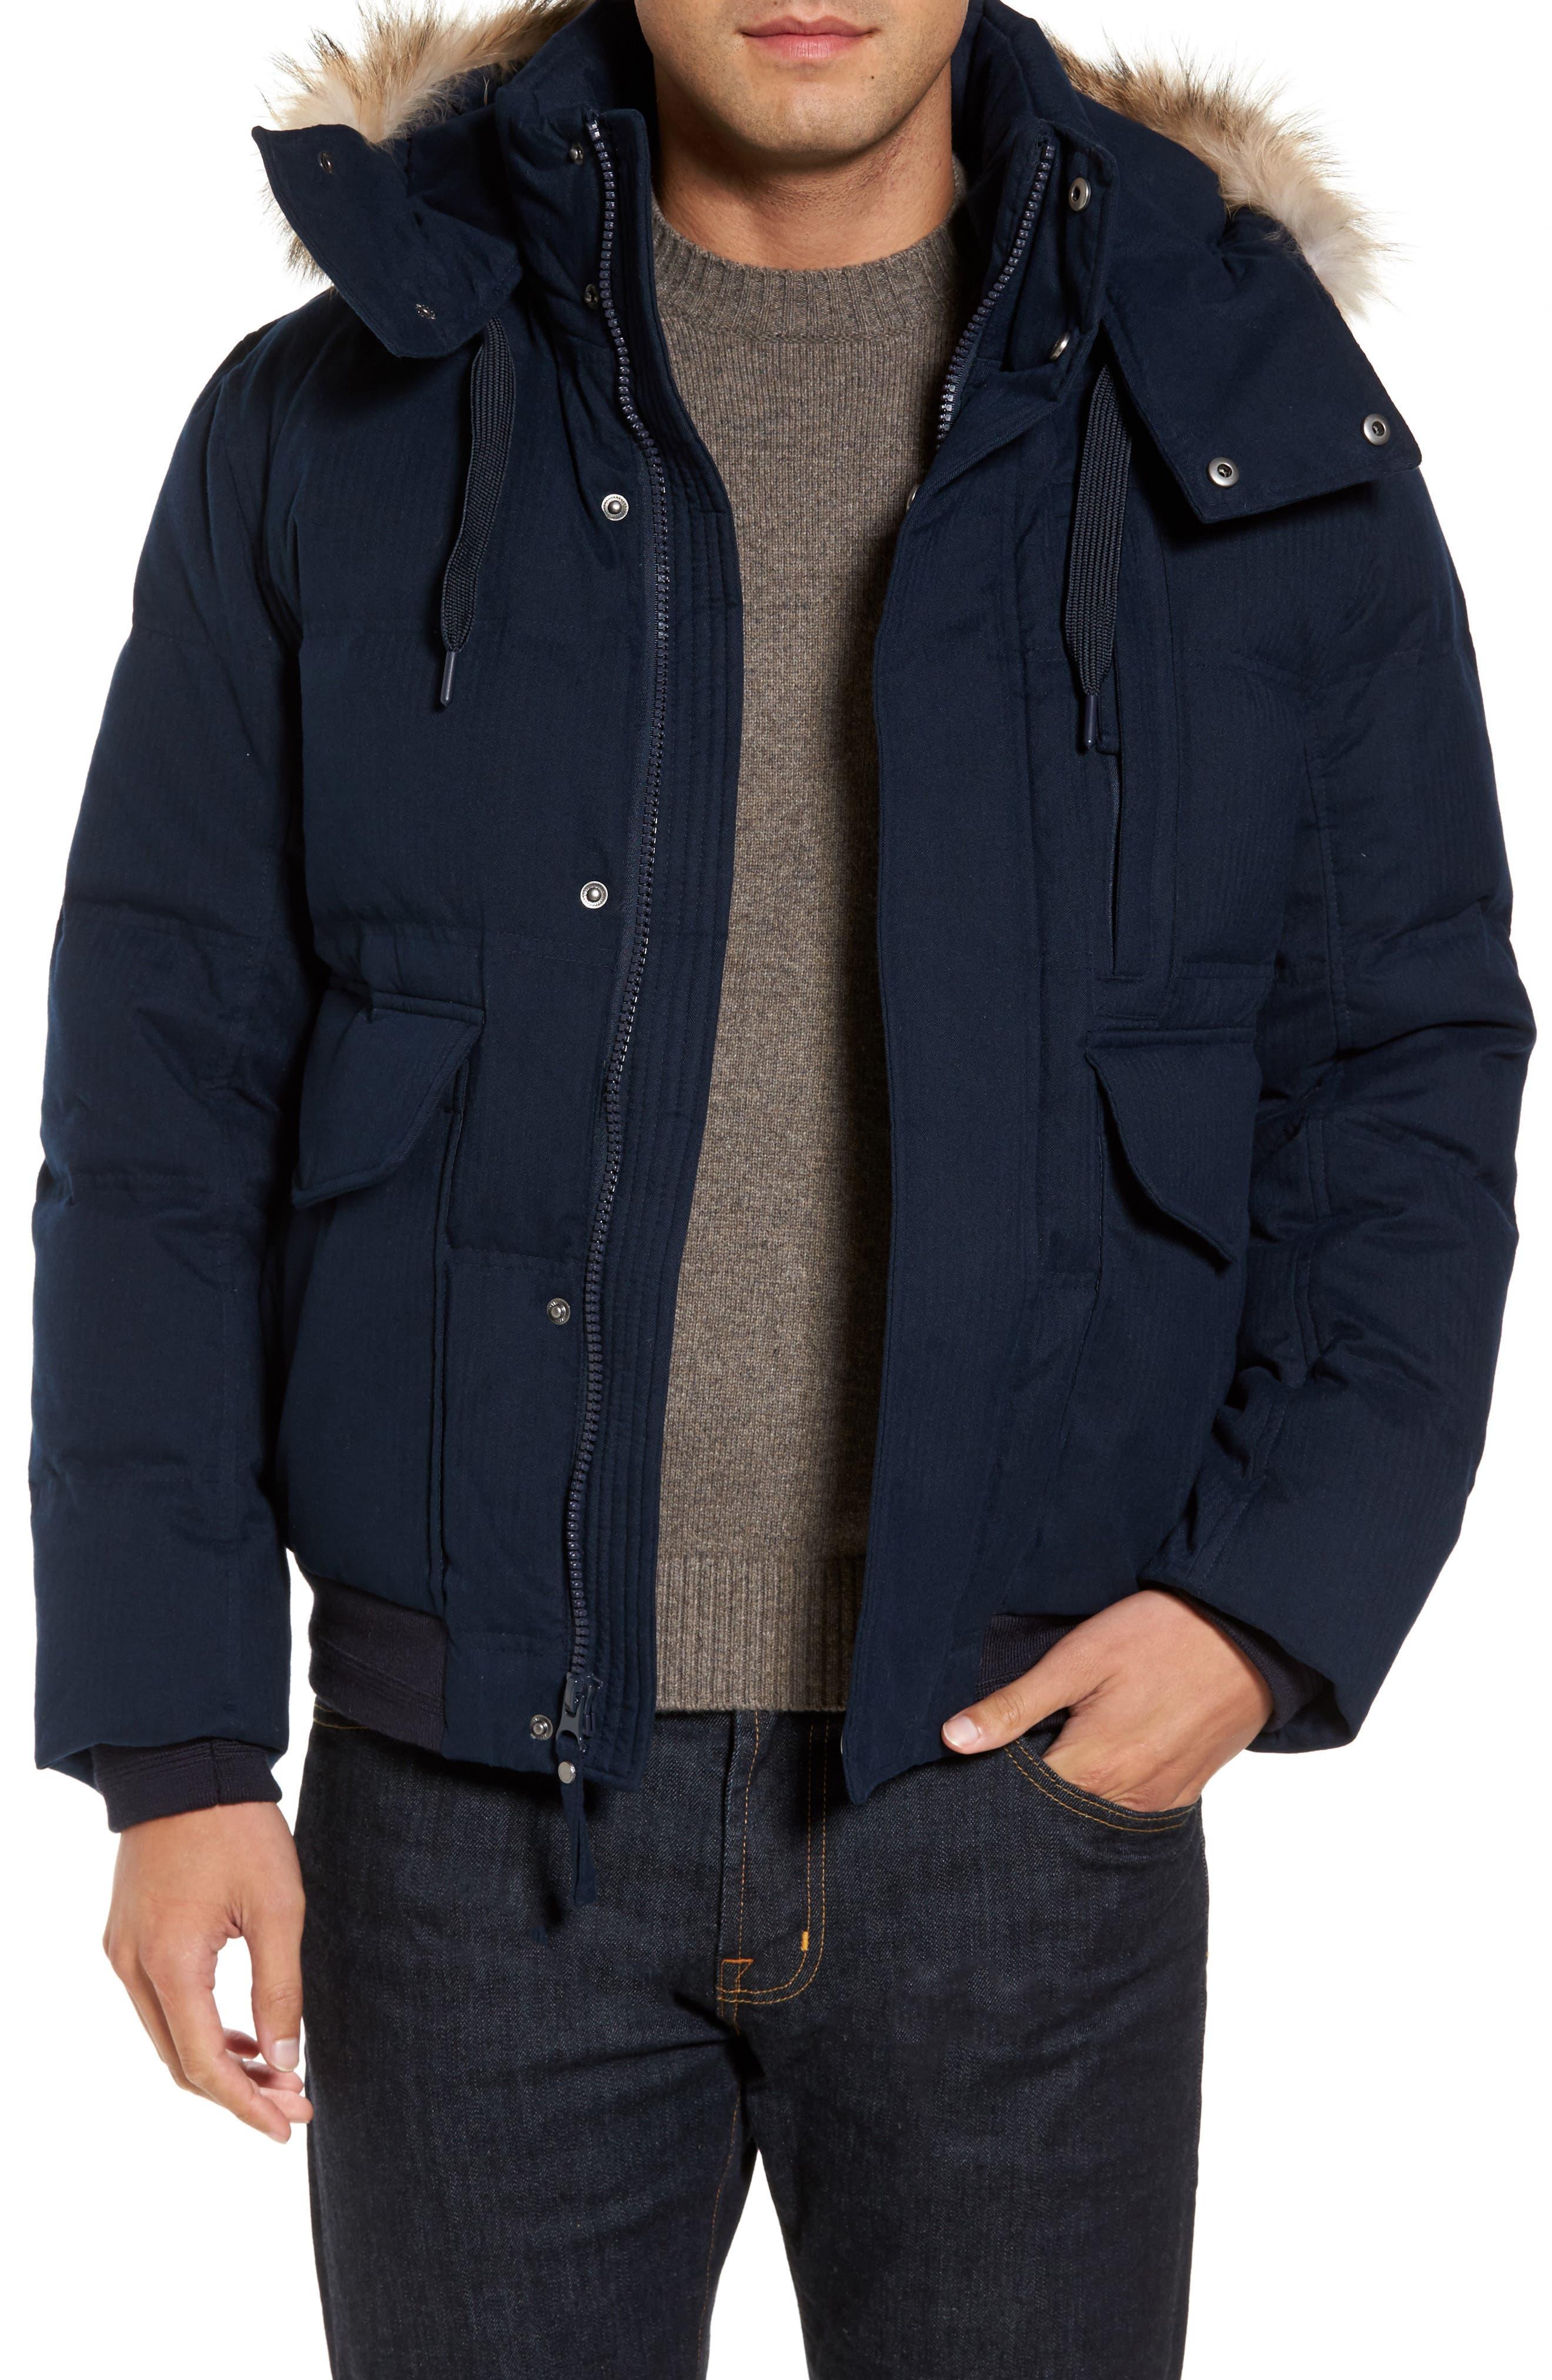 Main Image - Marc New York Down Herringbone Jacket with Genuine Coyote Fur Trim